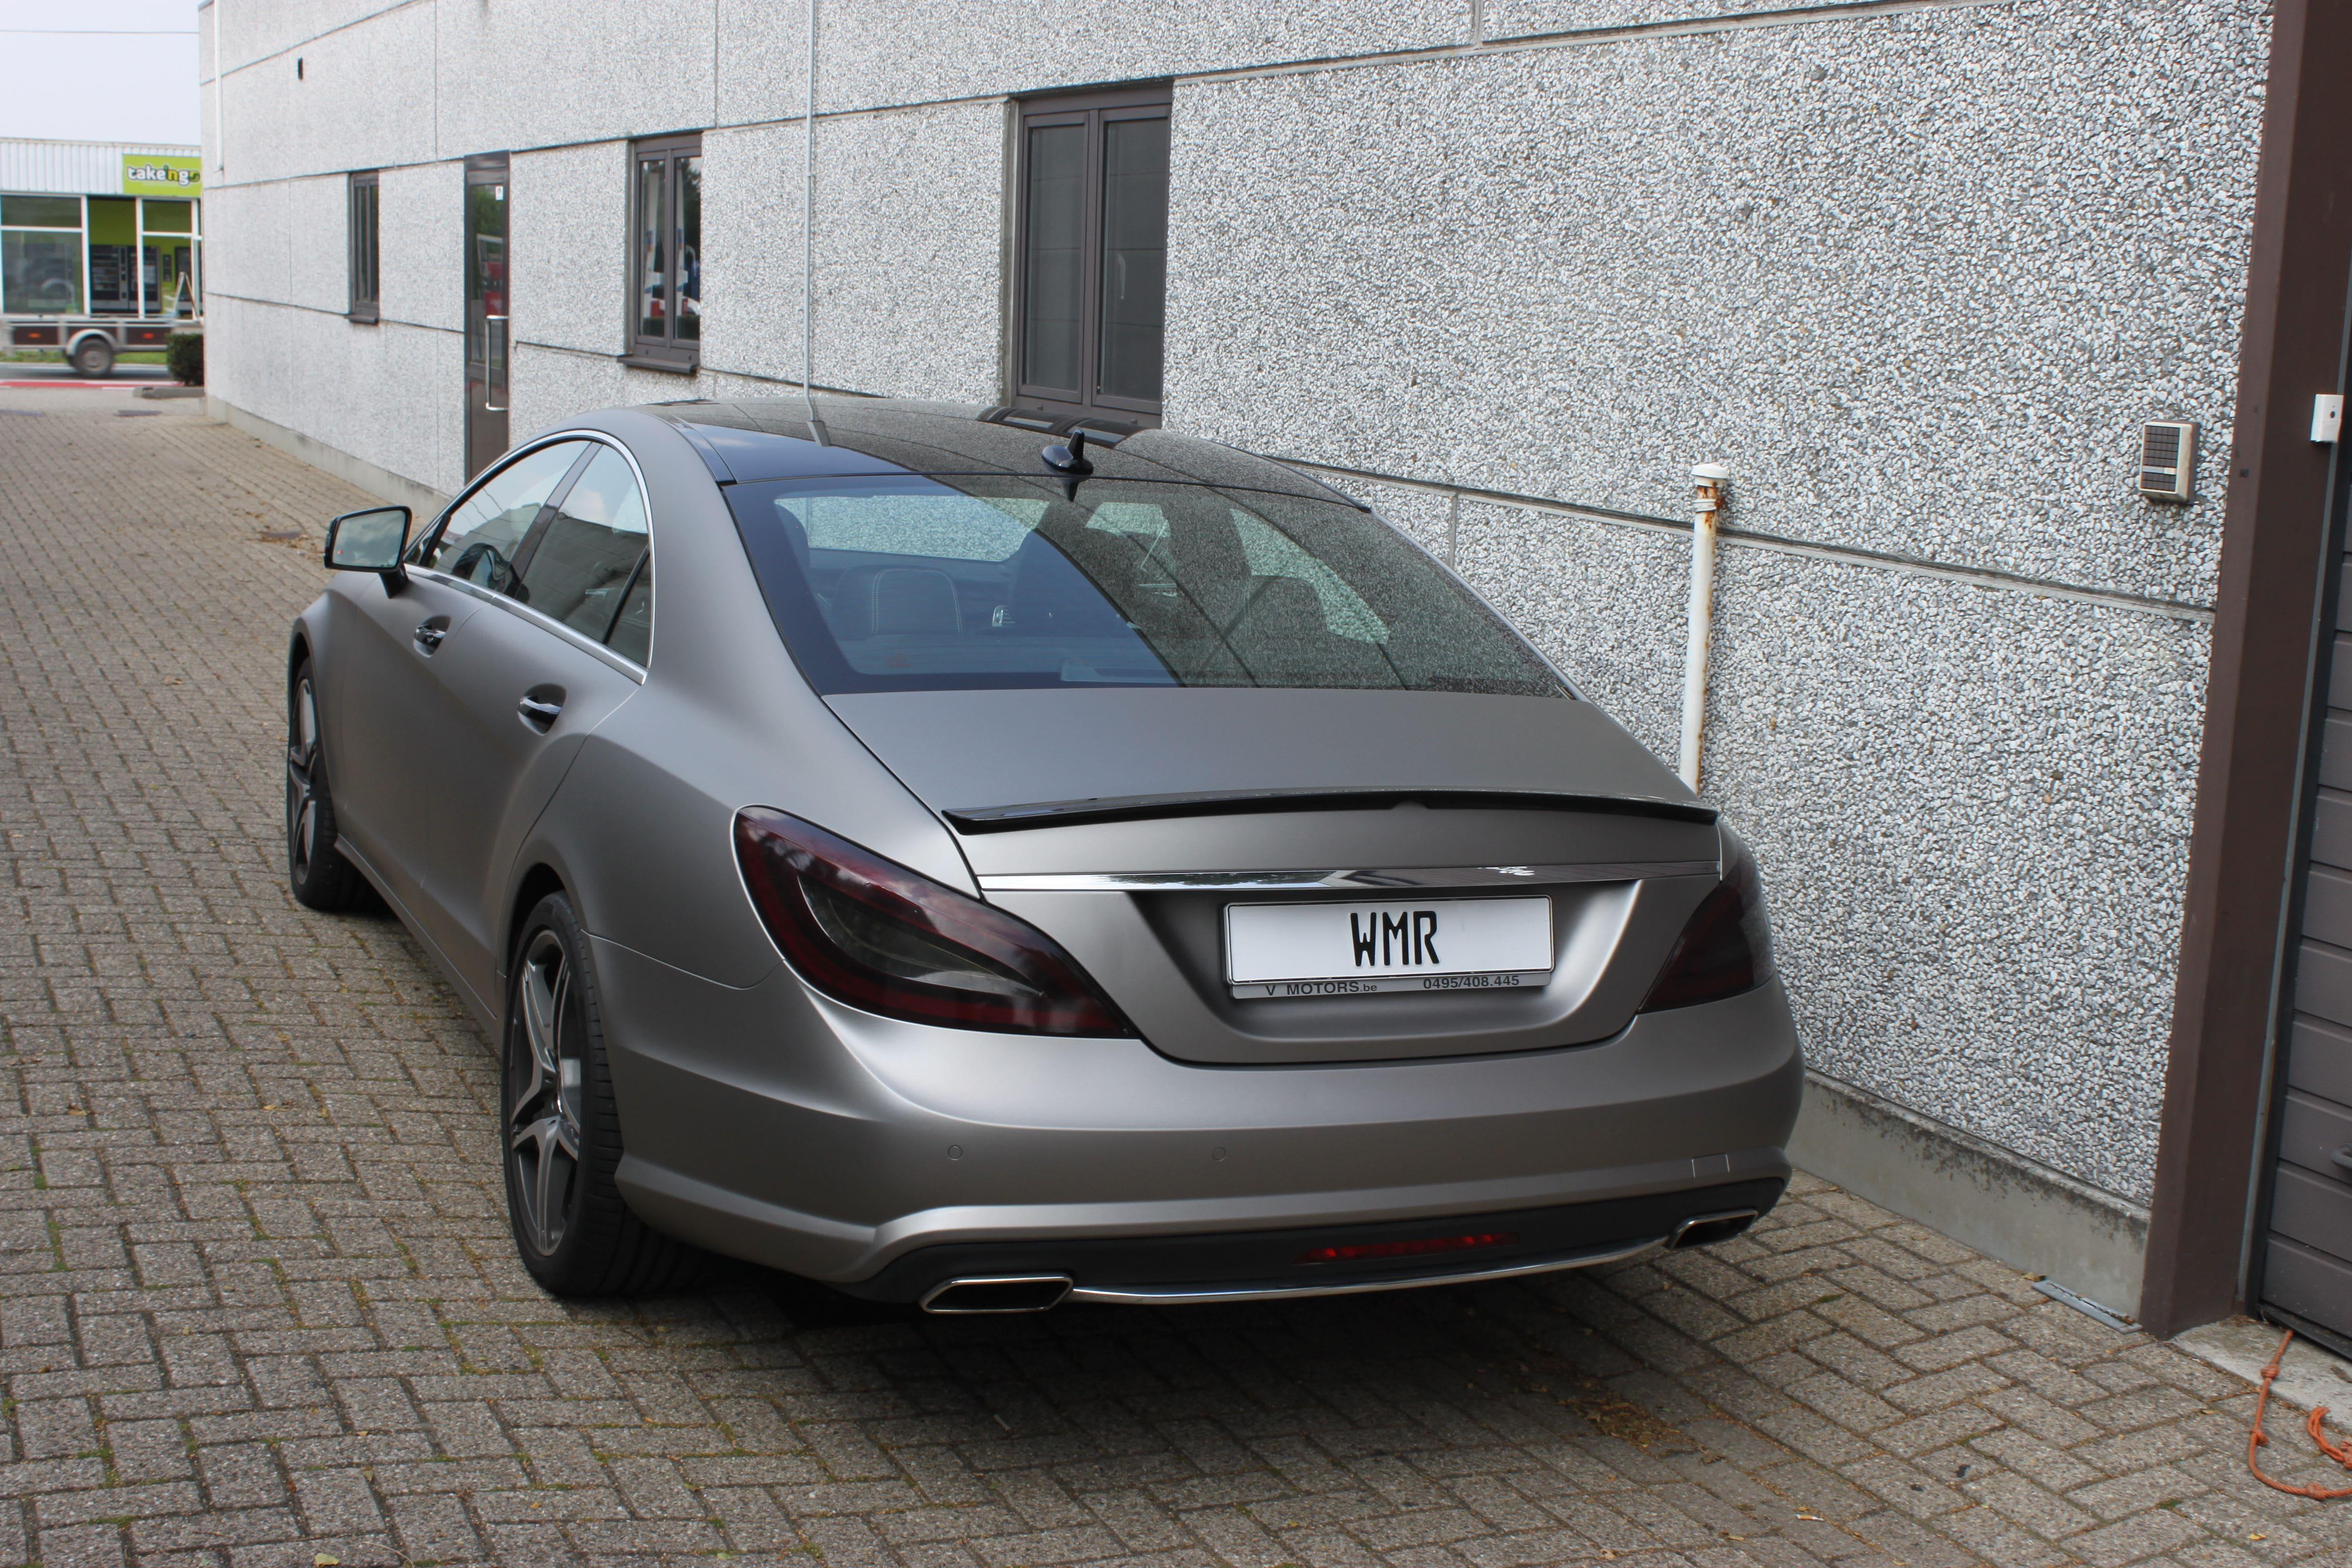 Mercedes CLS met Mat Grey Aluminium Wrap, Carwrapping door Wrapmyride.nu Foto-nr:6151, ©2020